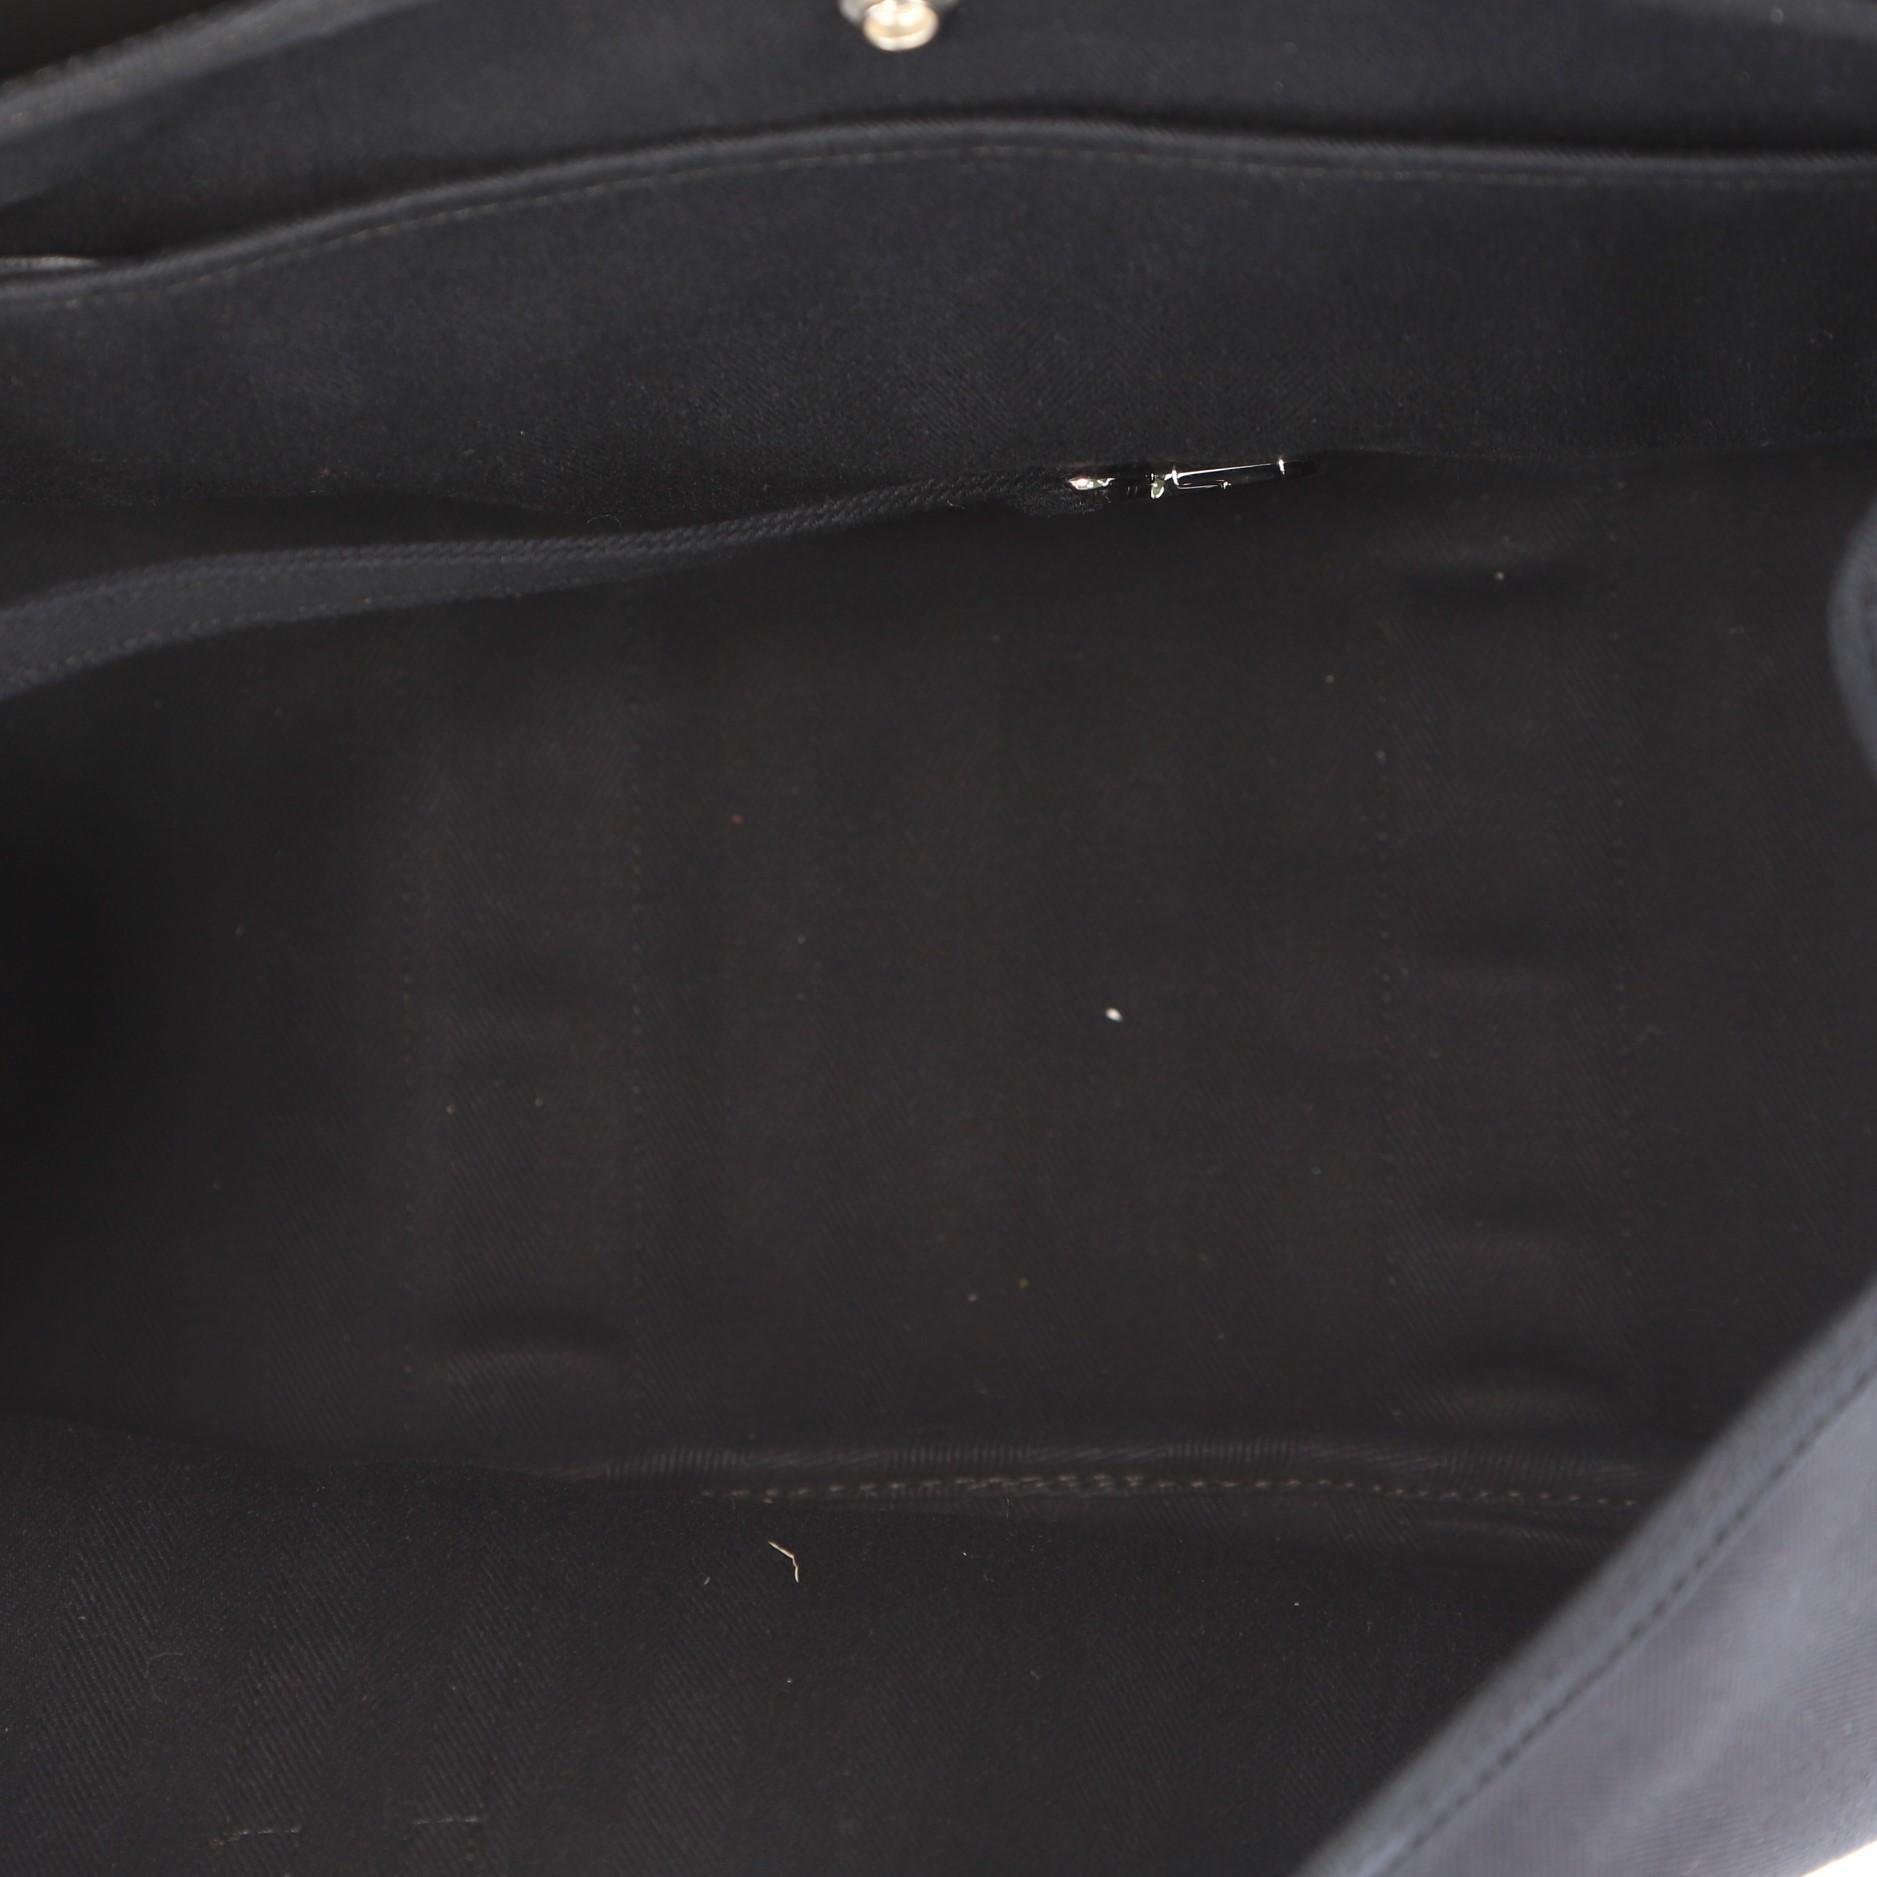 ... official hermes valparaiso handbag toile and leather mm for sale at  1stdibs e2e2b 67dbc e80acda3eb185